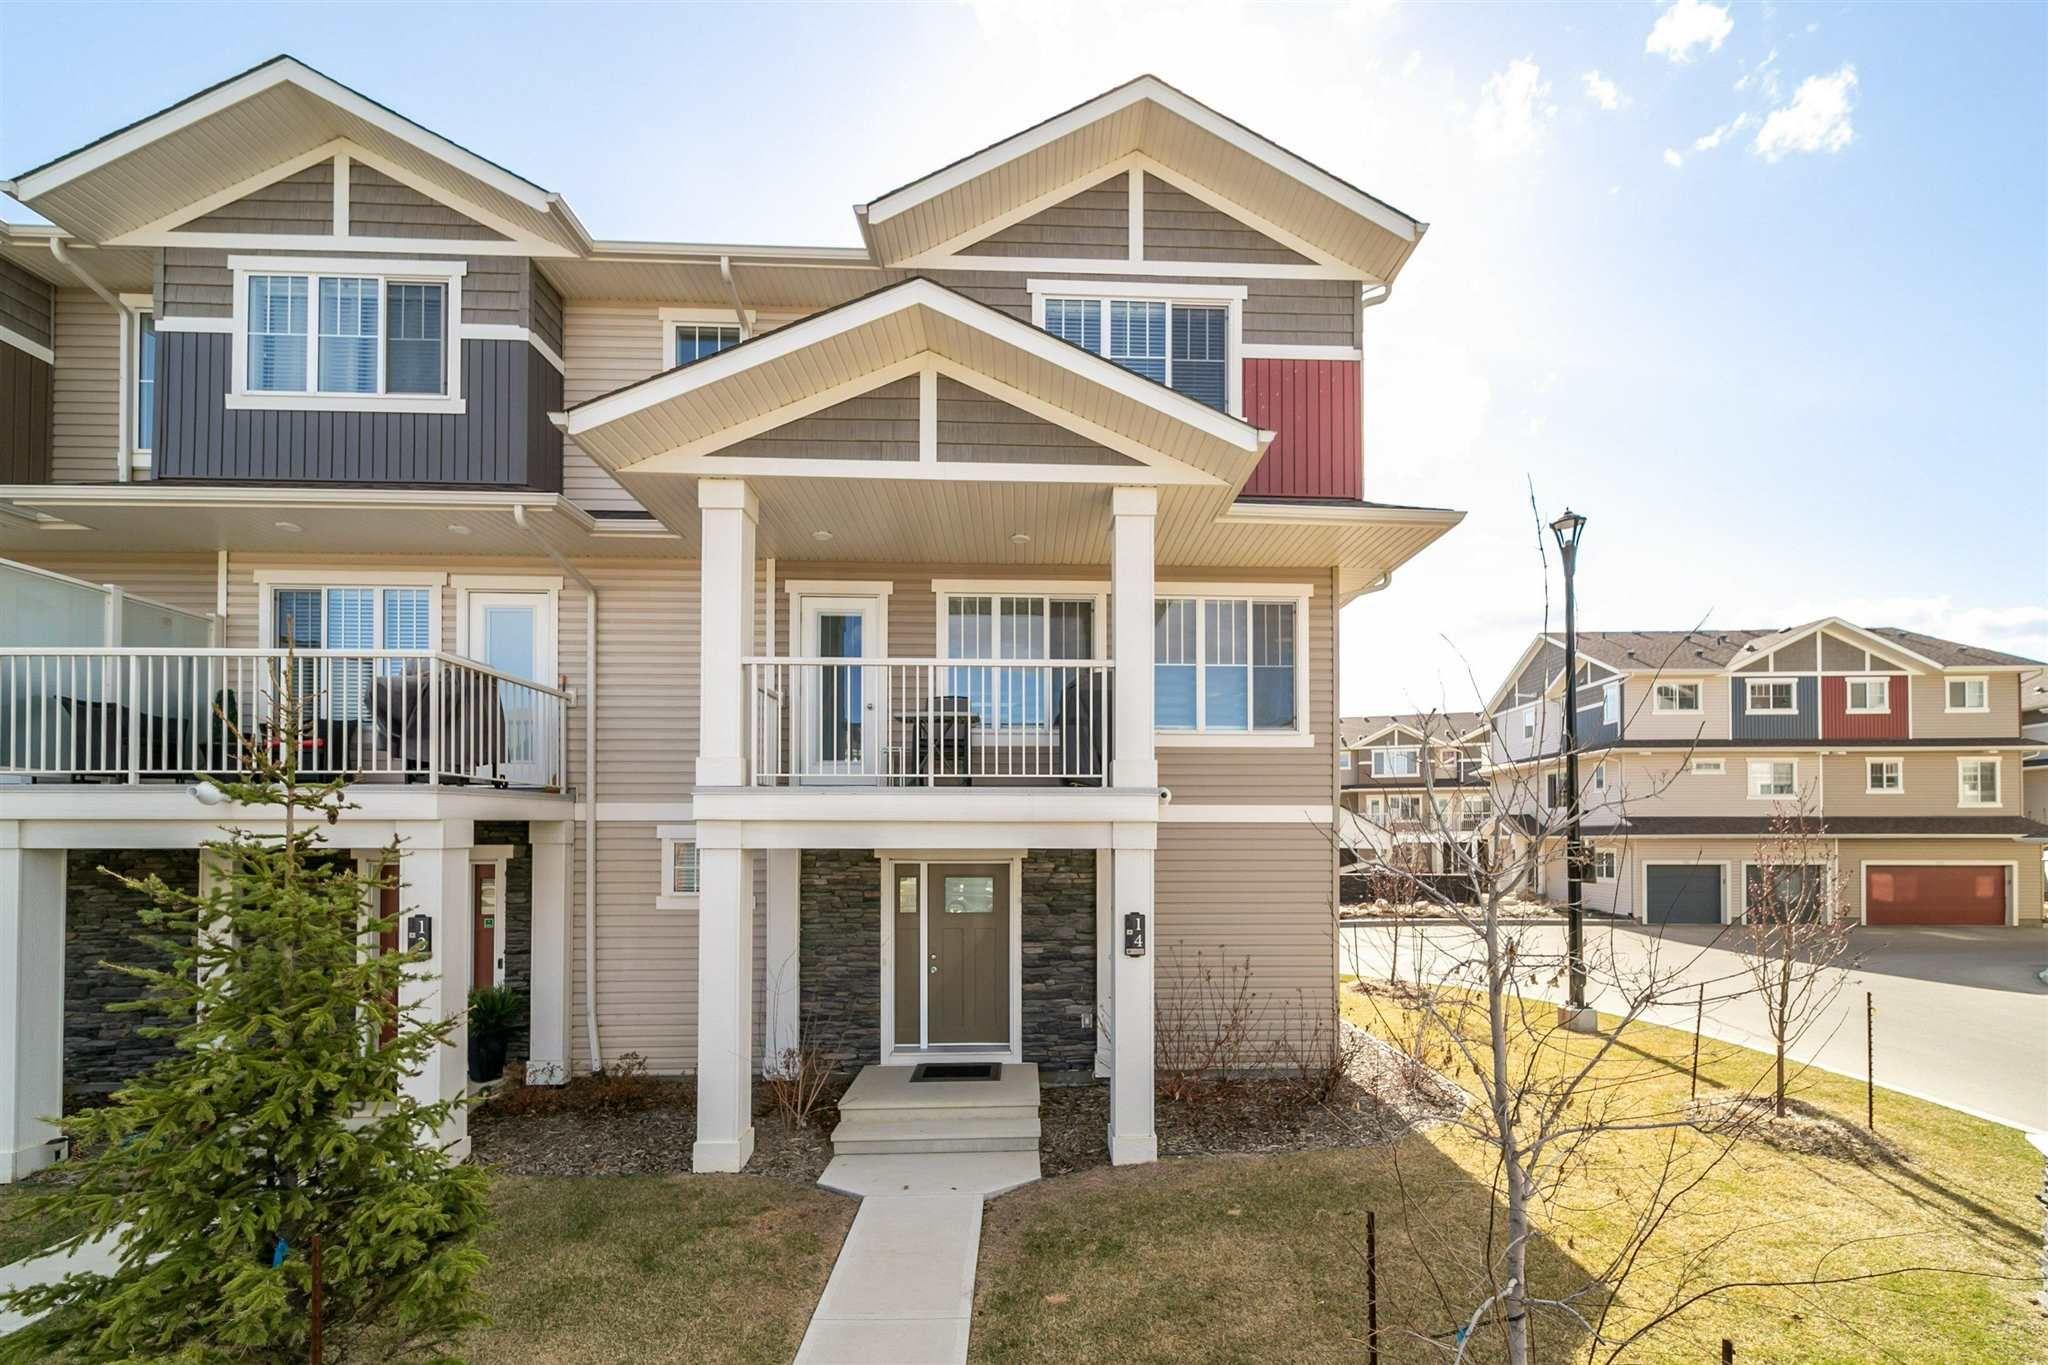 Main Photo: 14 17832 78 Street in Edmonton: Zone 28 Townhouse for sale : MLS®# E4254941